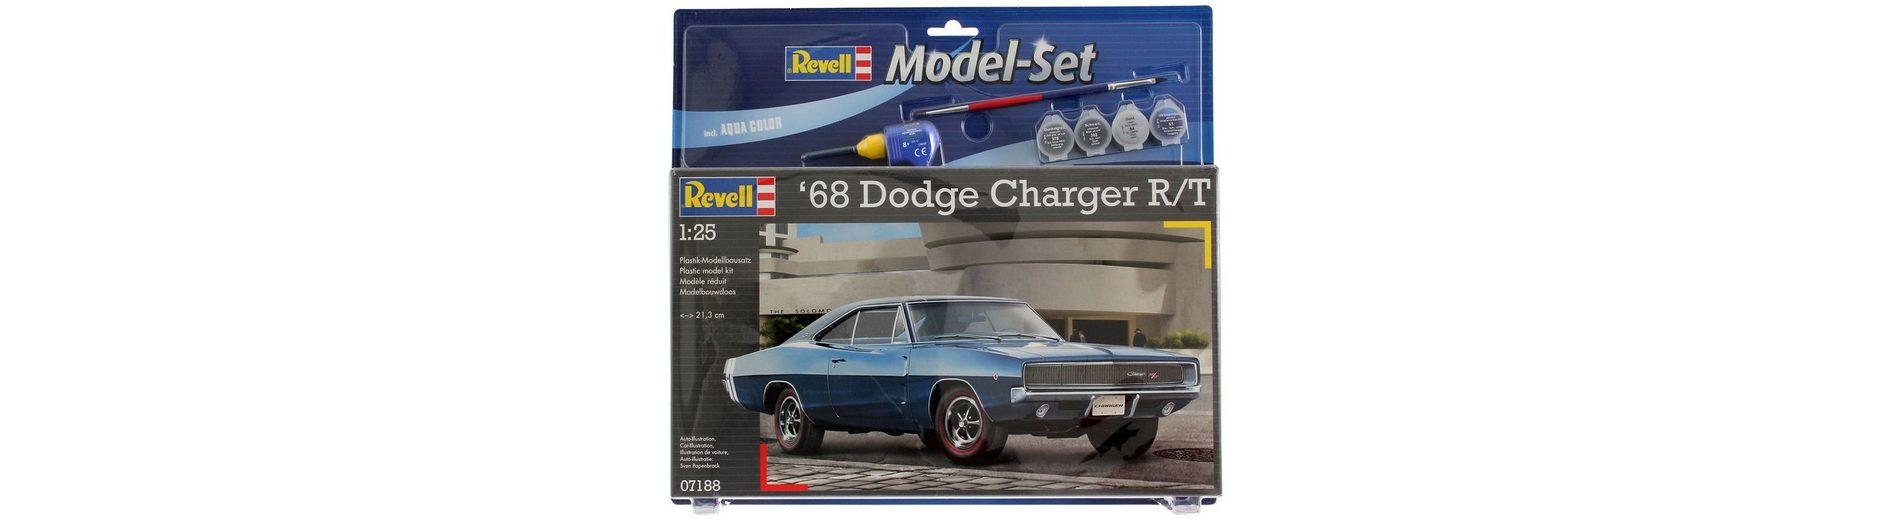 Revell® Modellbausatz Auto mit Zubehör, Maßstab 1:25, »Model Set - 1968 Dodge Charger«